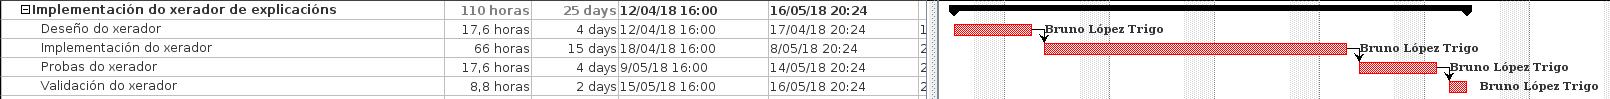 documentacion/memoria/figuras/incremento2.png